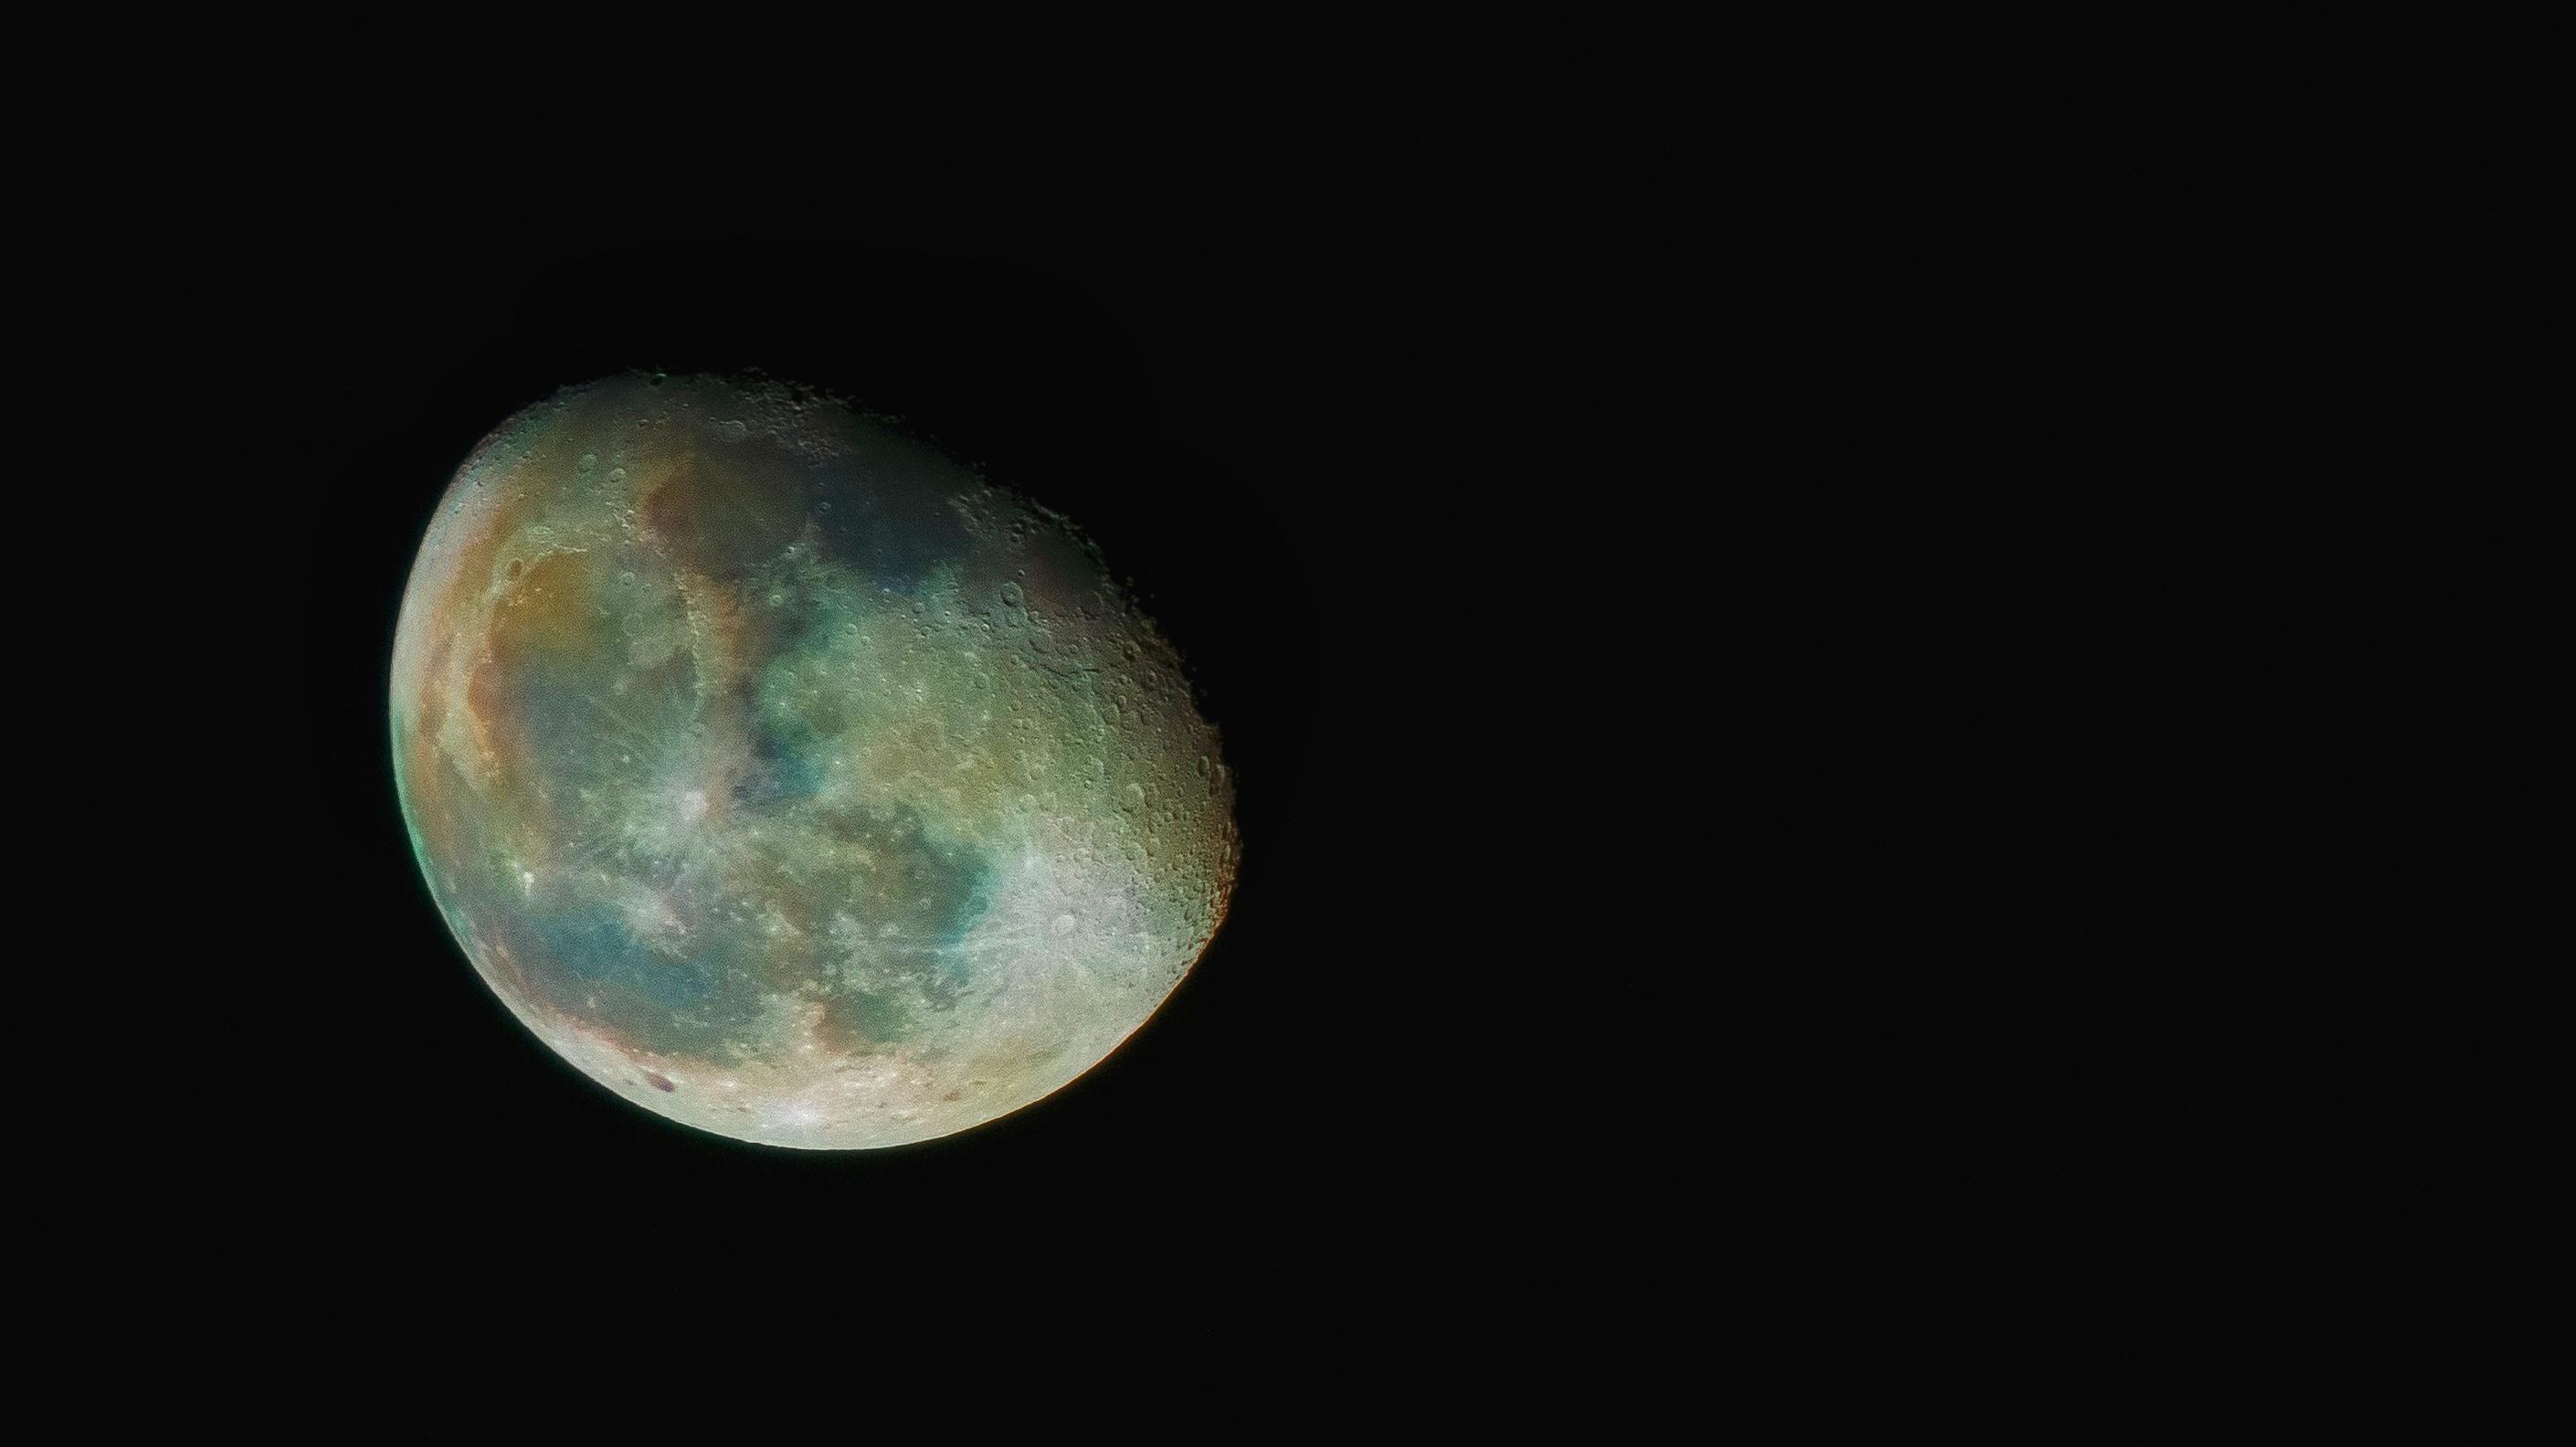 luna-**Personal info**.jpeg